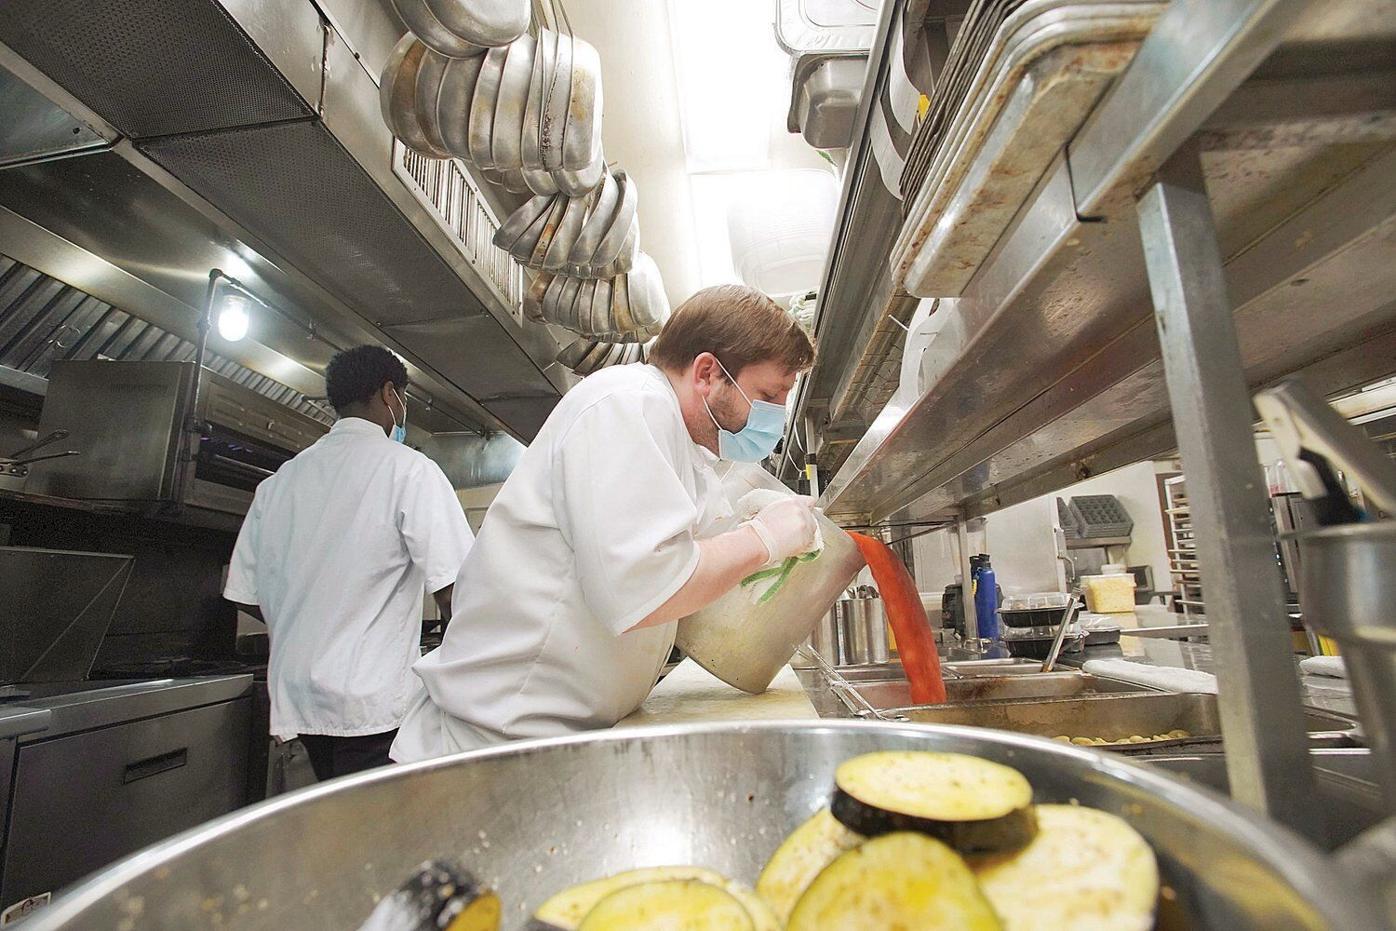 Staff prepare takeout meals at Mazzeo's Ristorante in the spring